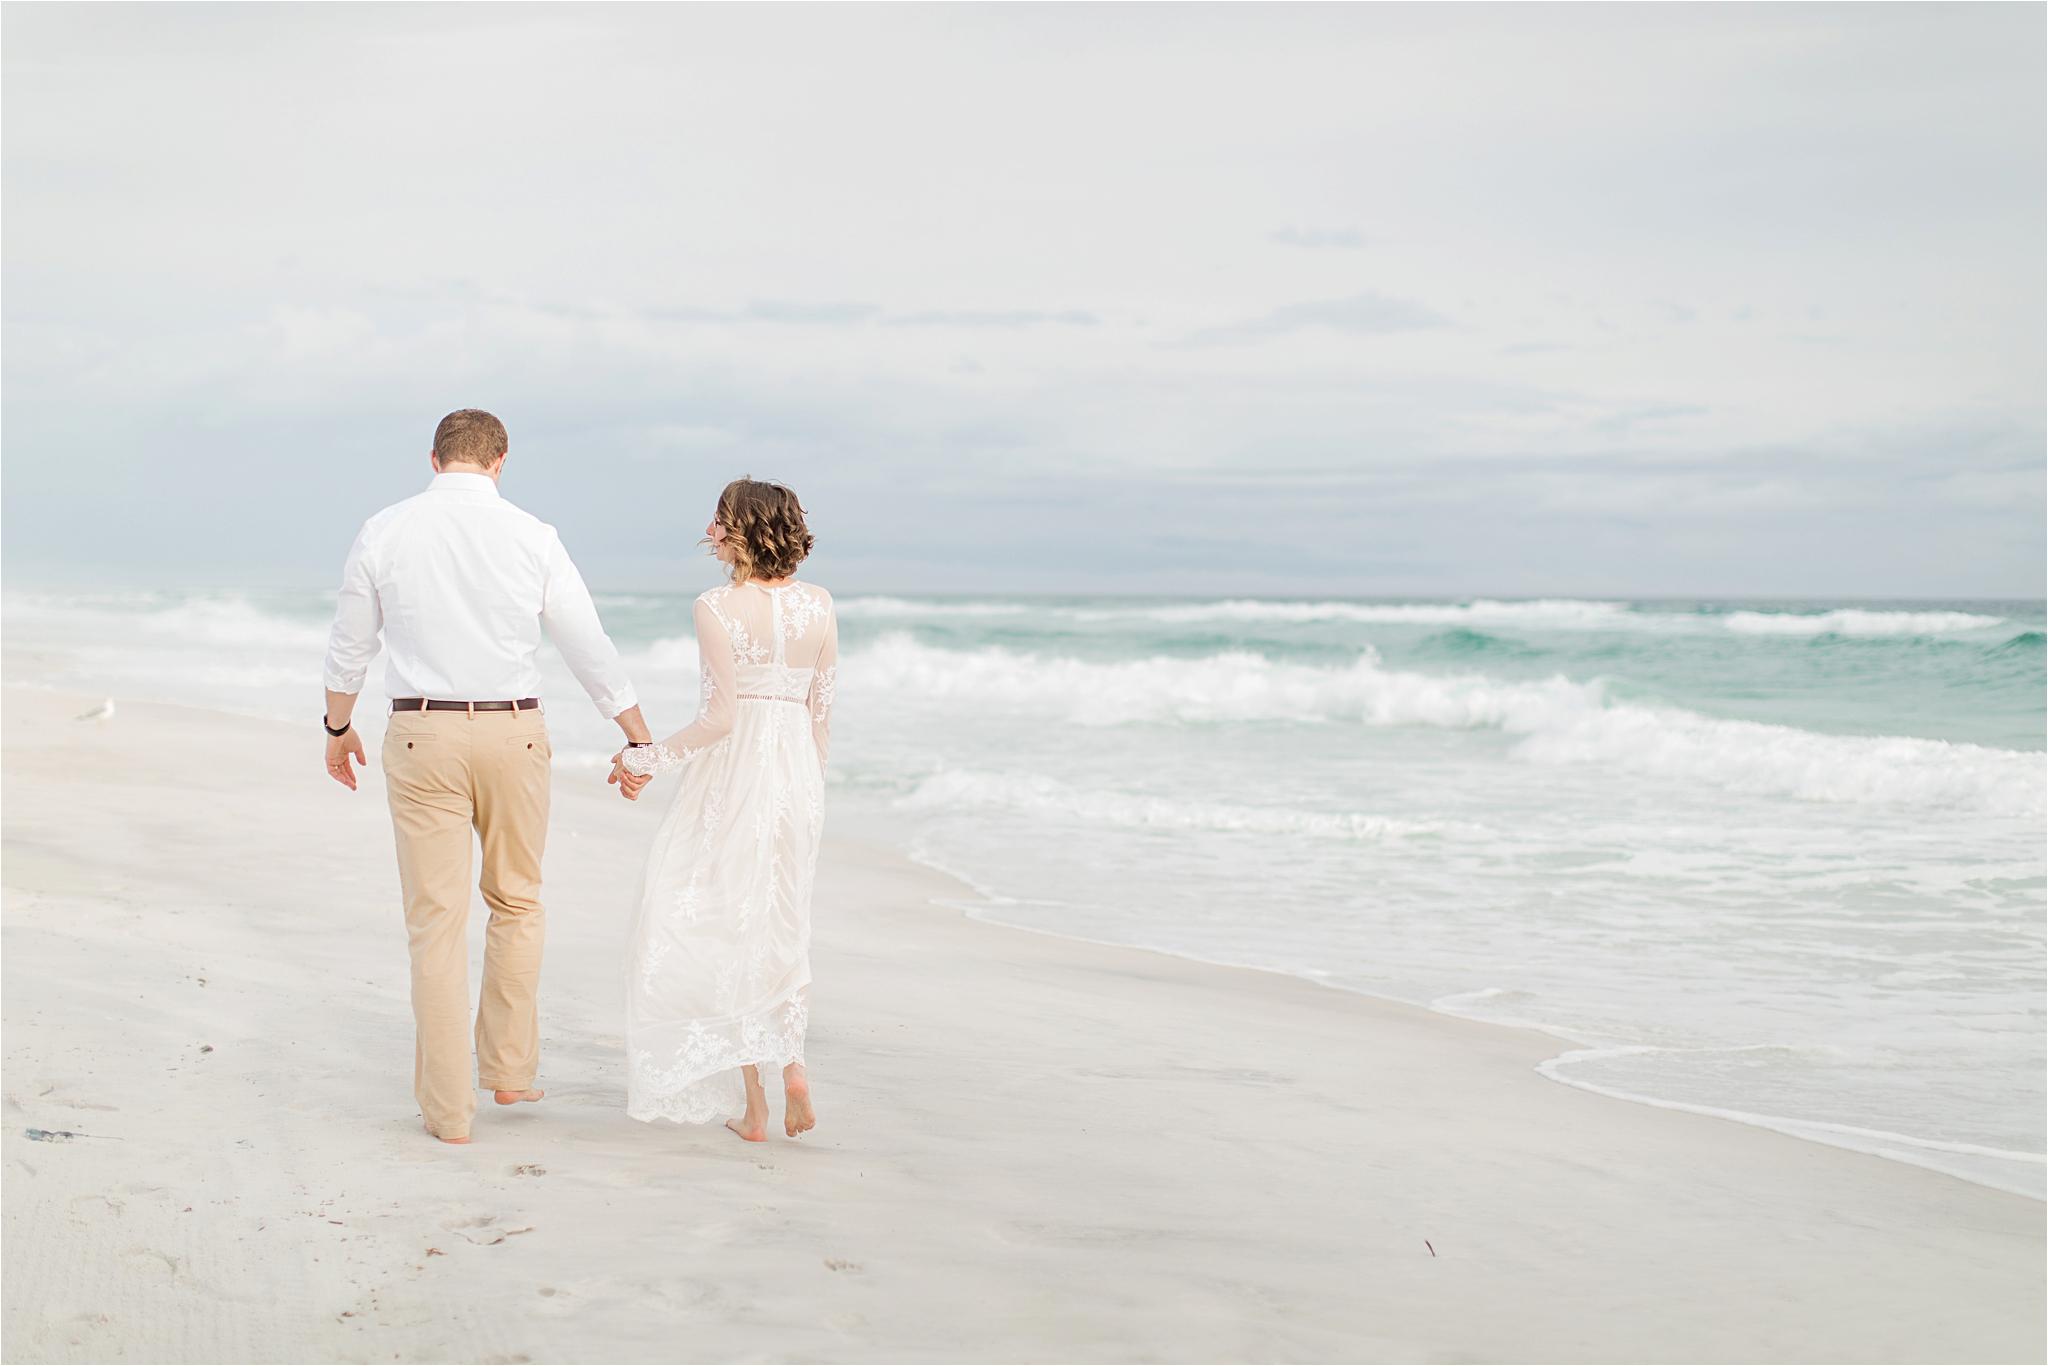 Romantic Pensacola Beach Photos at Sunset   Neil + Steph